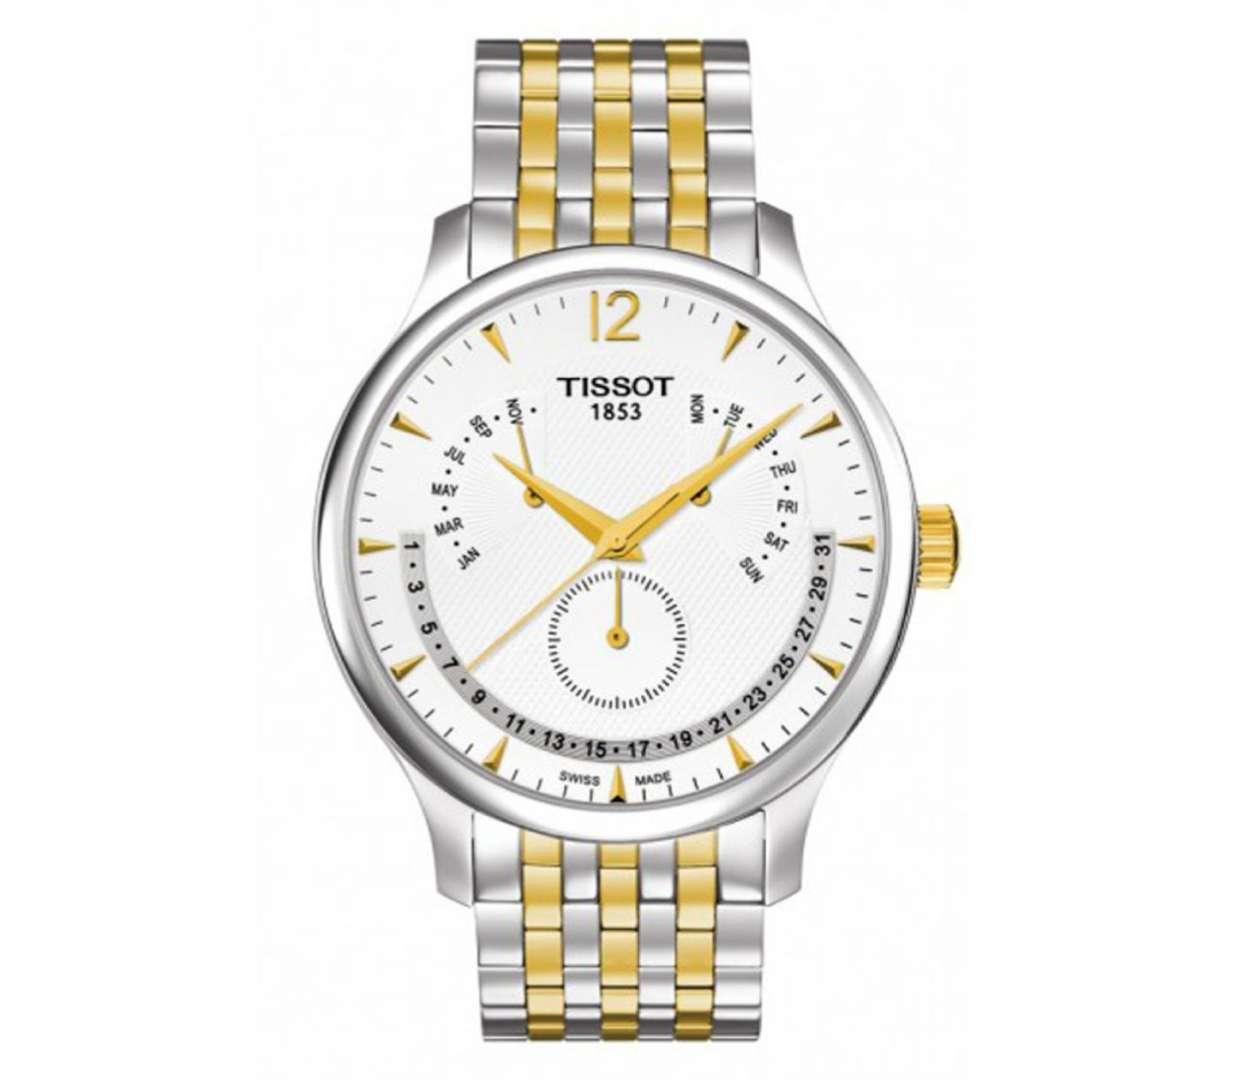 שעון יד אנלוגי tissot t063.637.22.037.00 טיסו